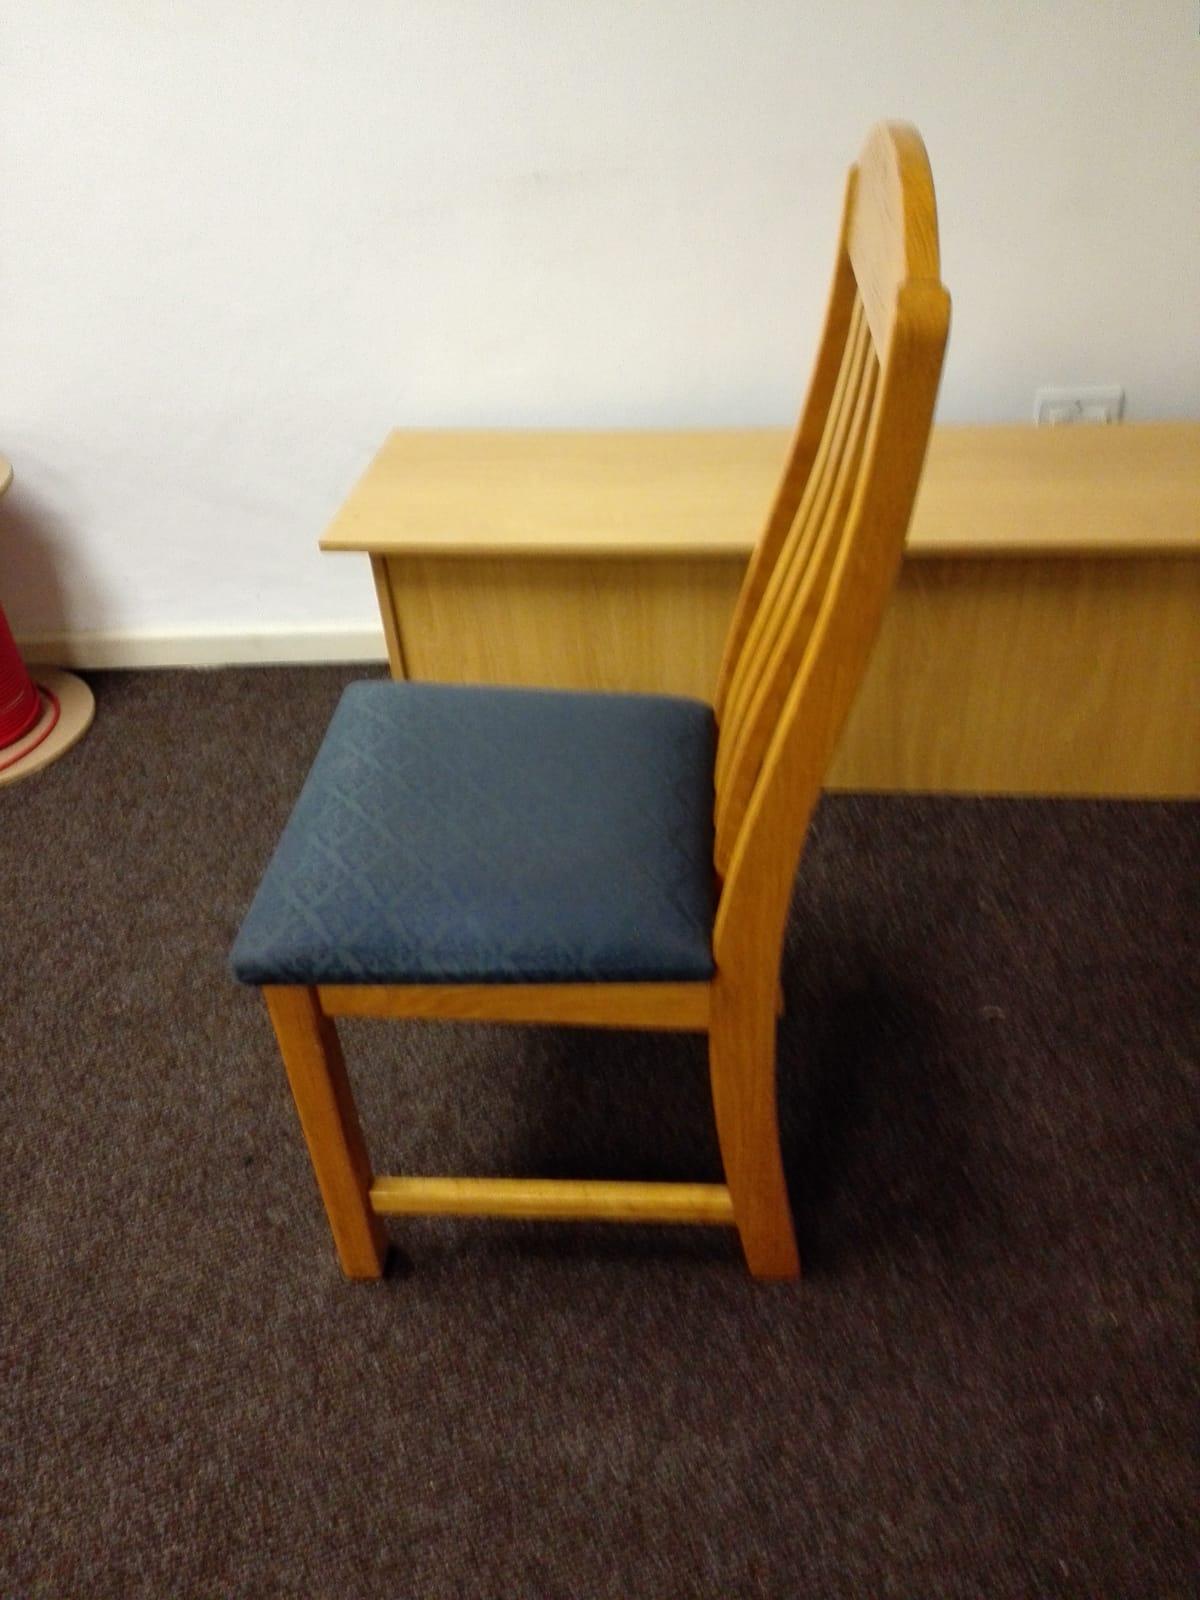 Three dining room chairs